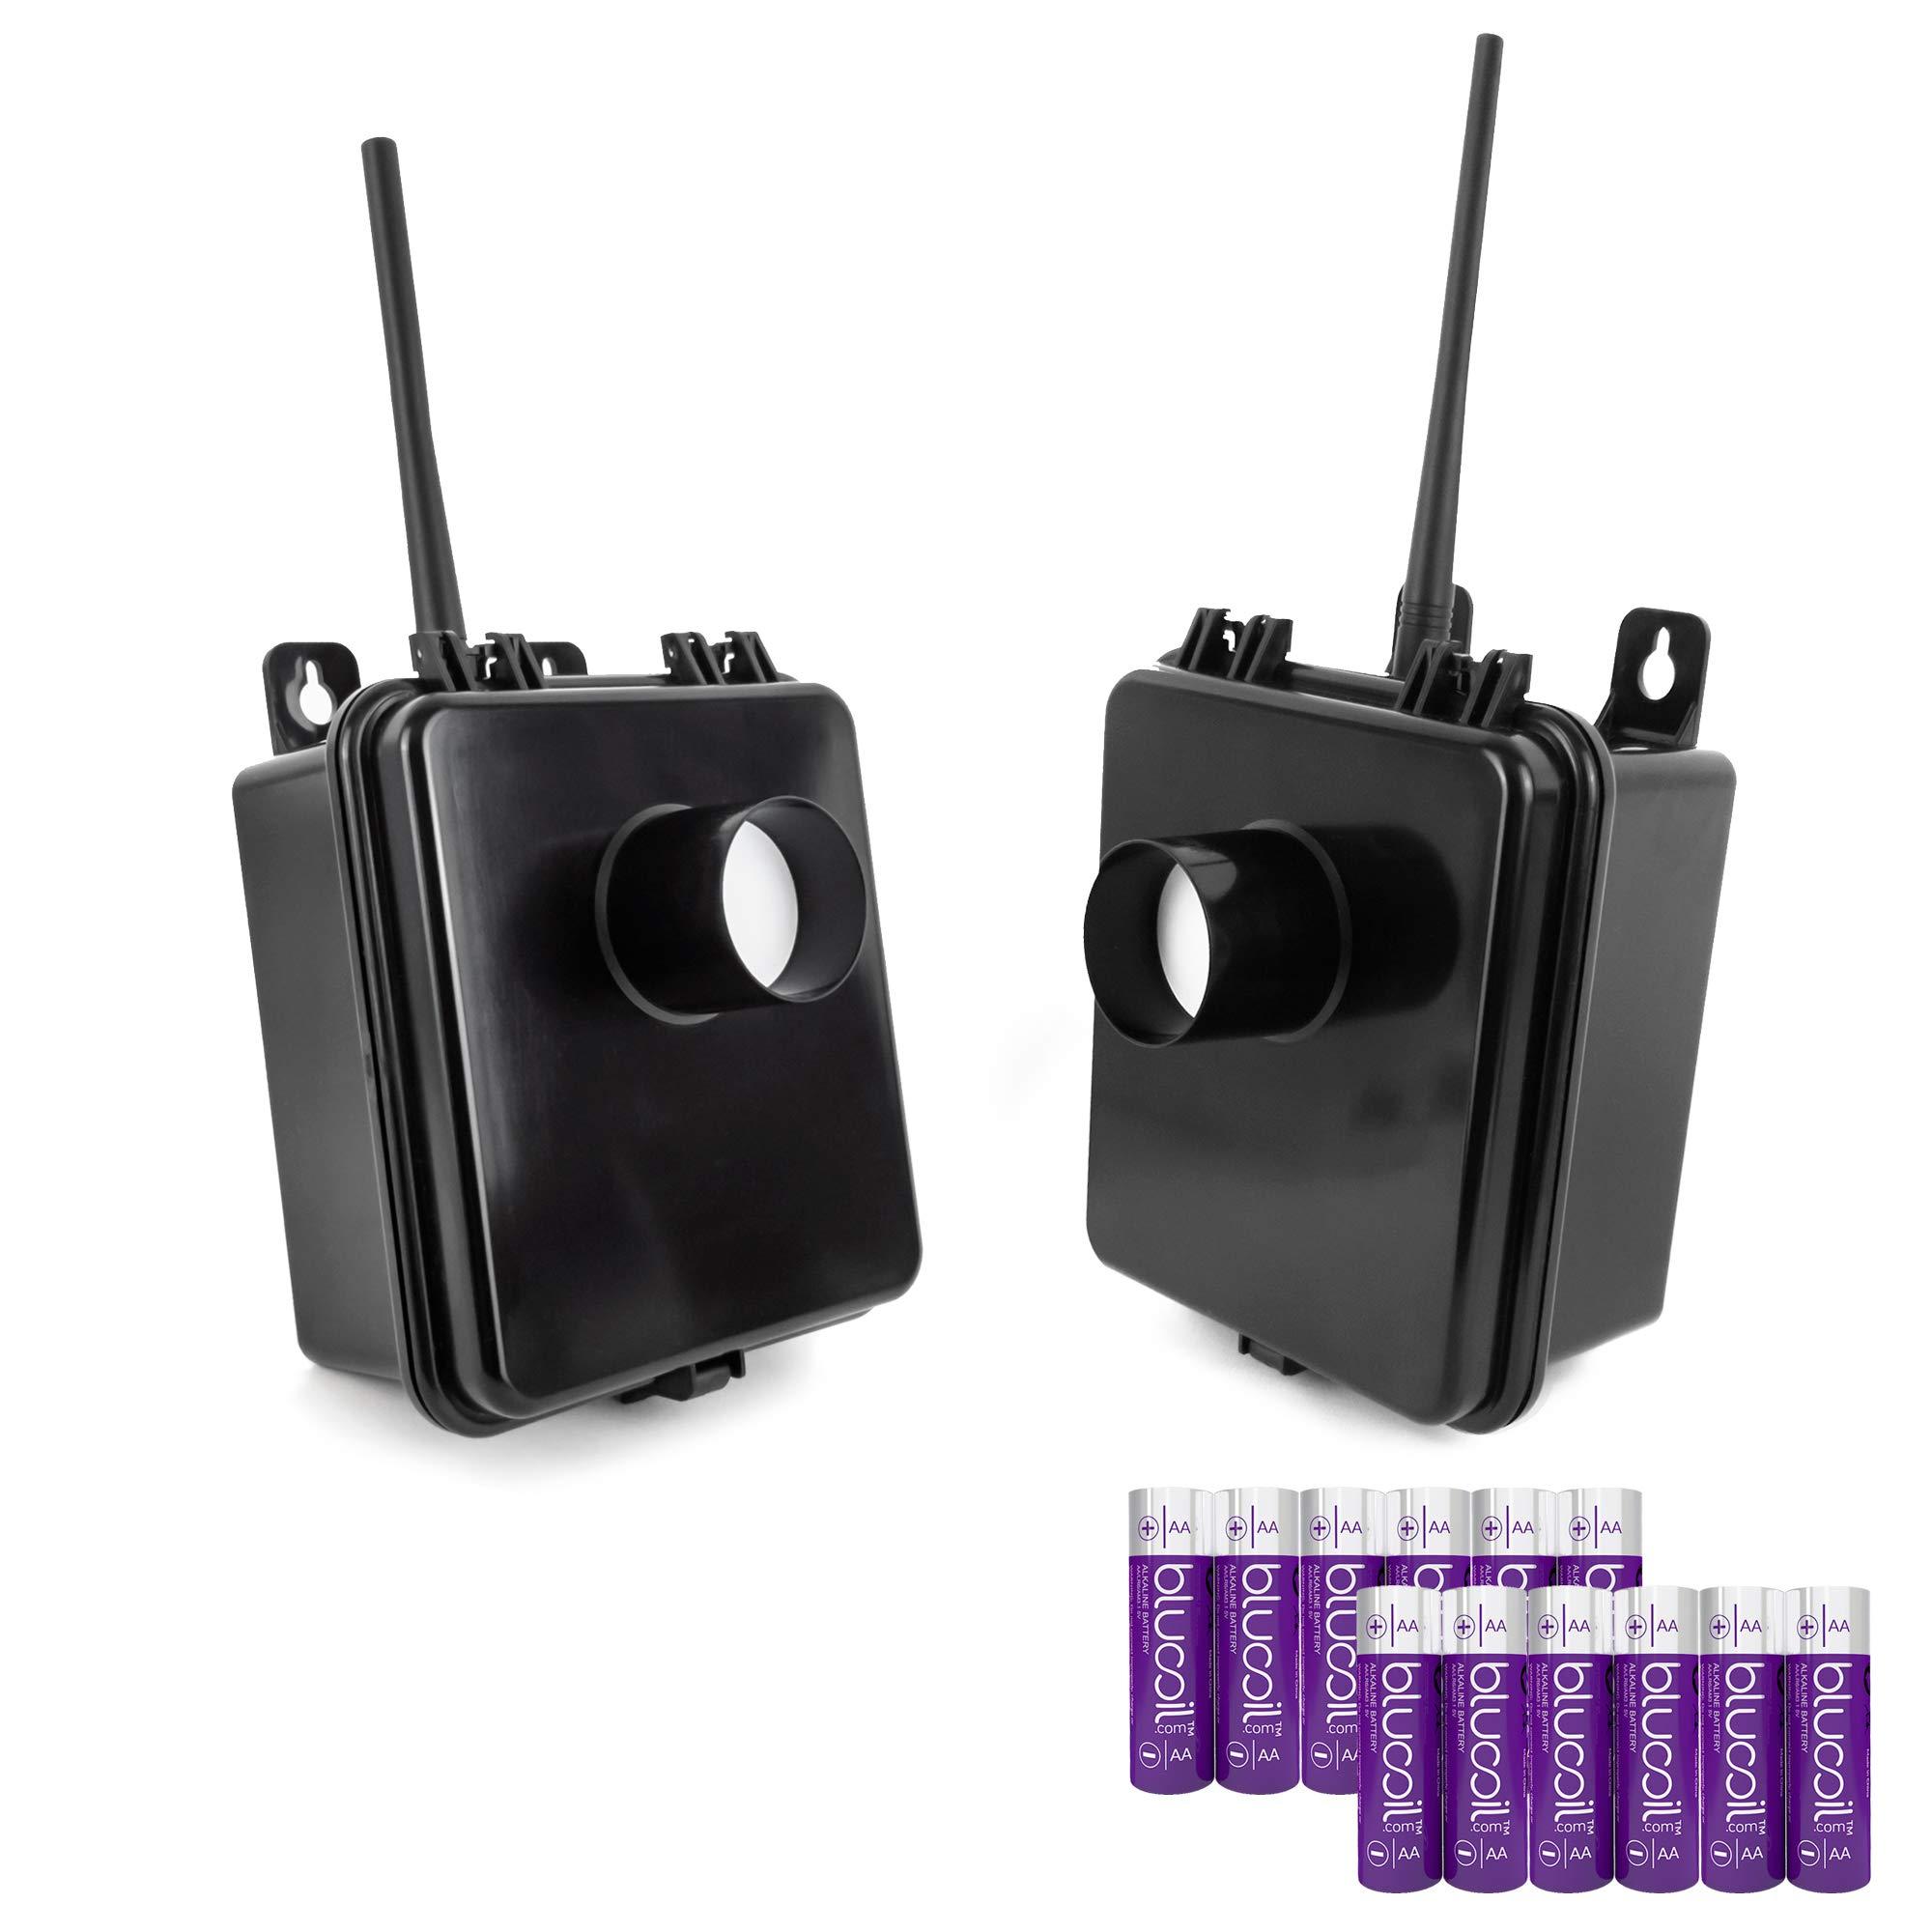 Dakota Alert MURS Alert Transmitter - Passive Infrared Motion Detector (2-Pack) Bundle with Blucoil AA Batteries (12-Pack)